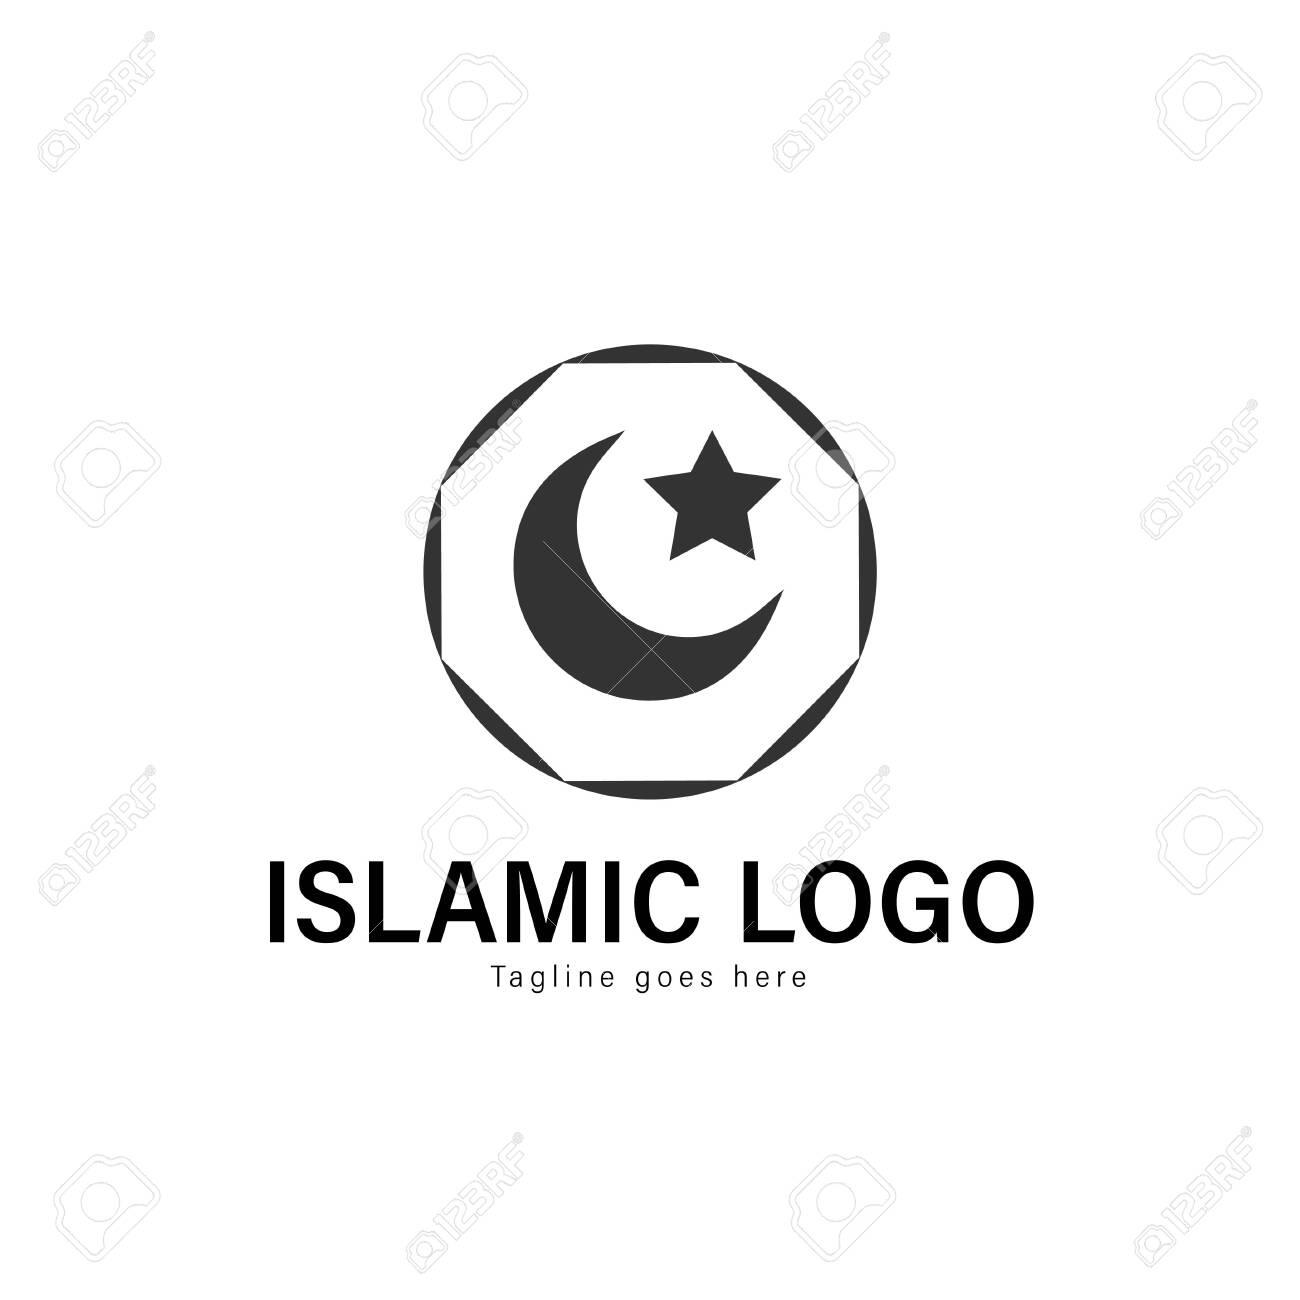 Islamic logo template design  Islamic logo with modern frame